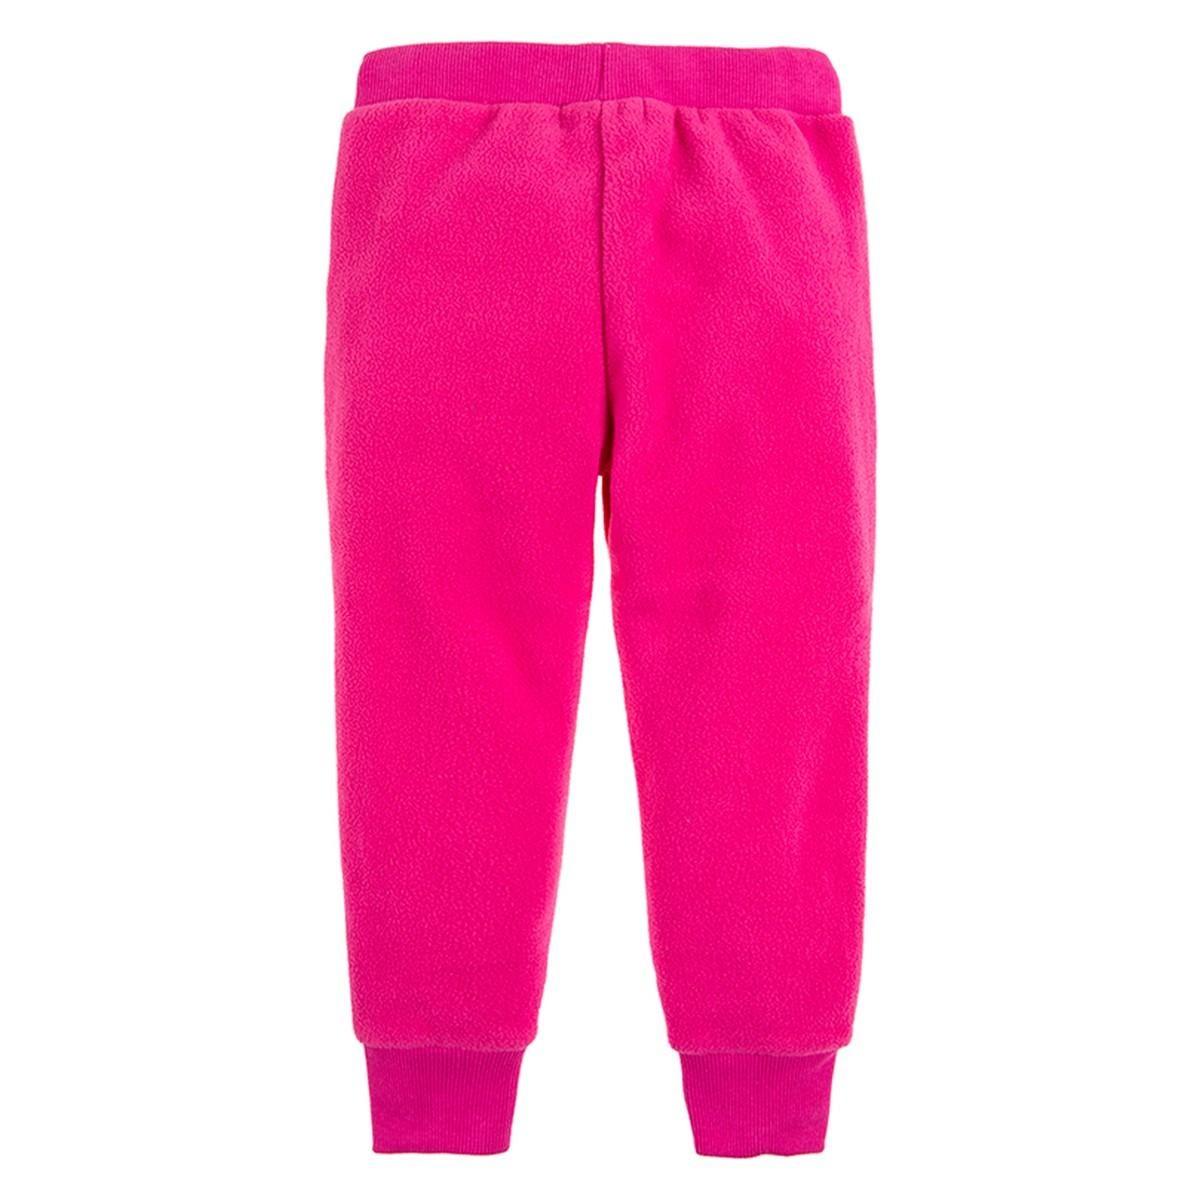 Pantaloni Cool Club Casual (4978) photo 1